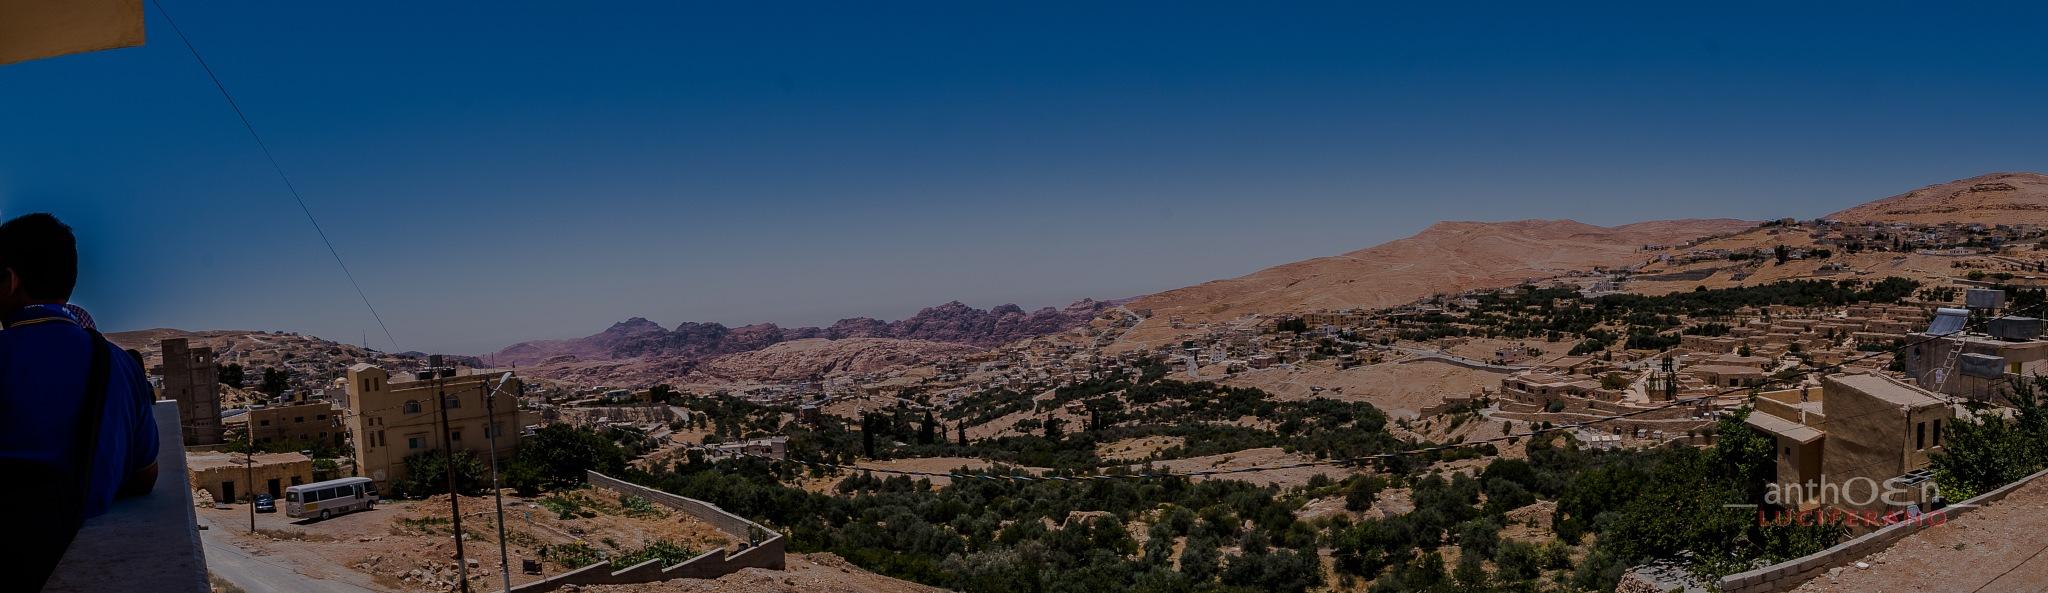 Panoramic on Petra Magic Restaurant by Anthoen Luciferano Karnanta